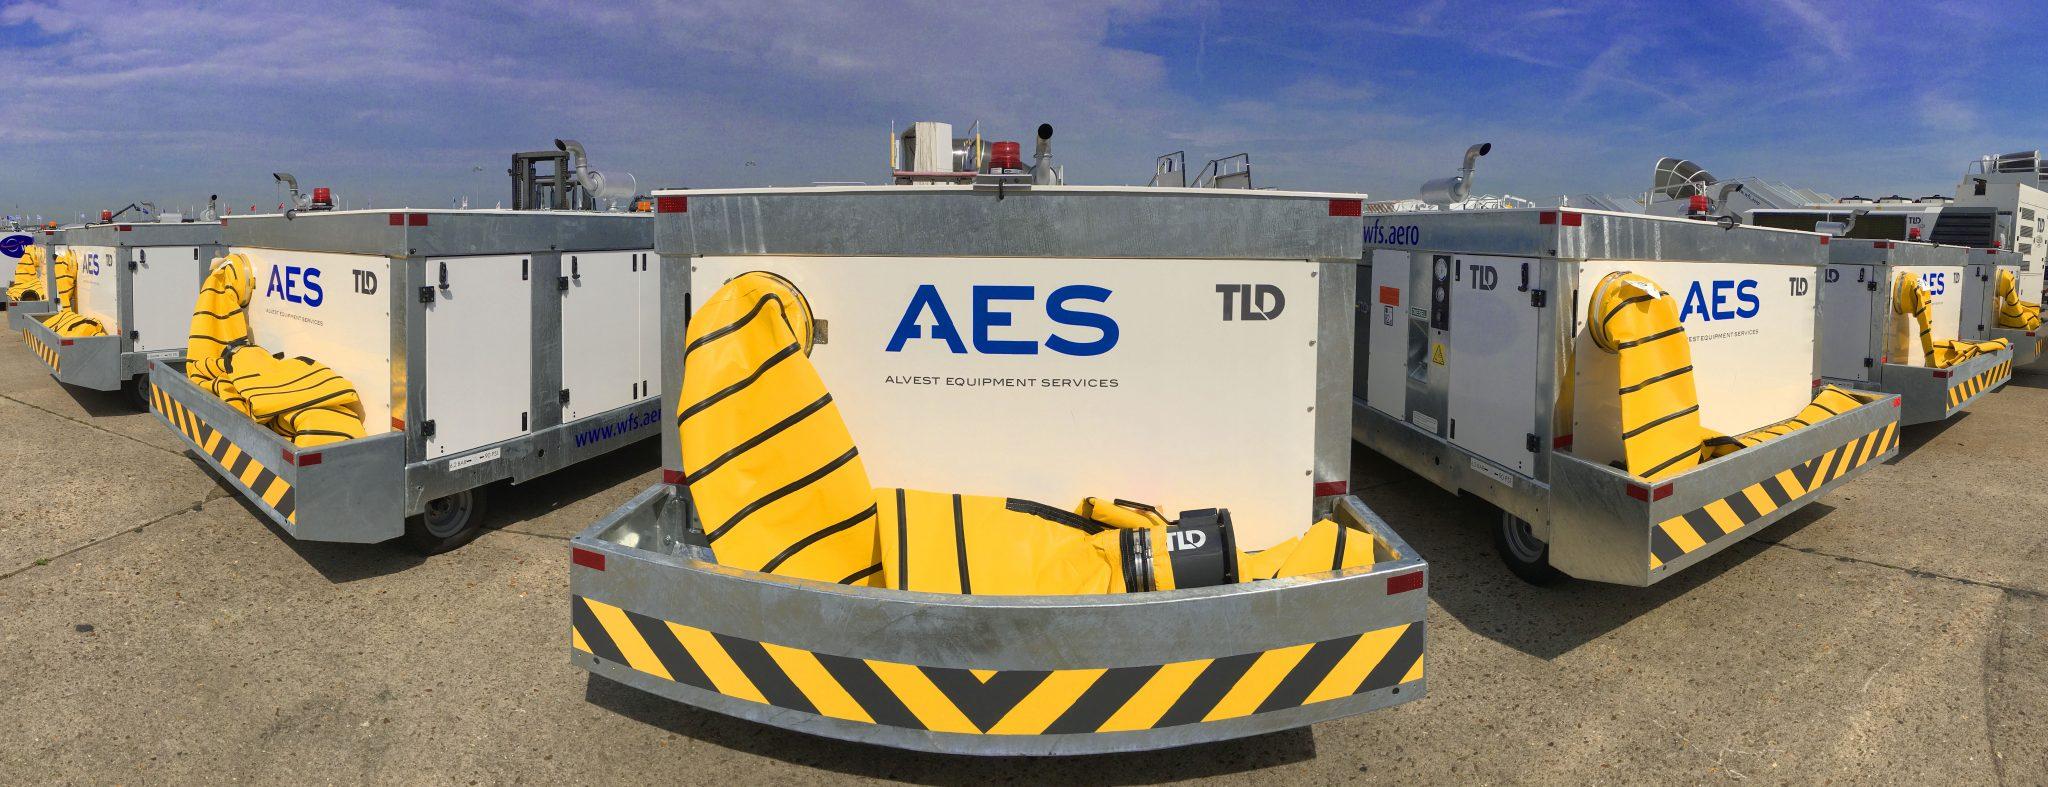 Alvest Equipment Services